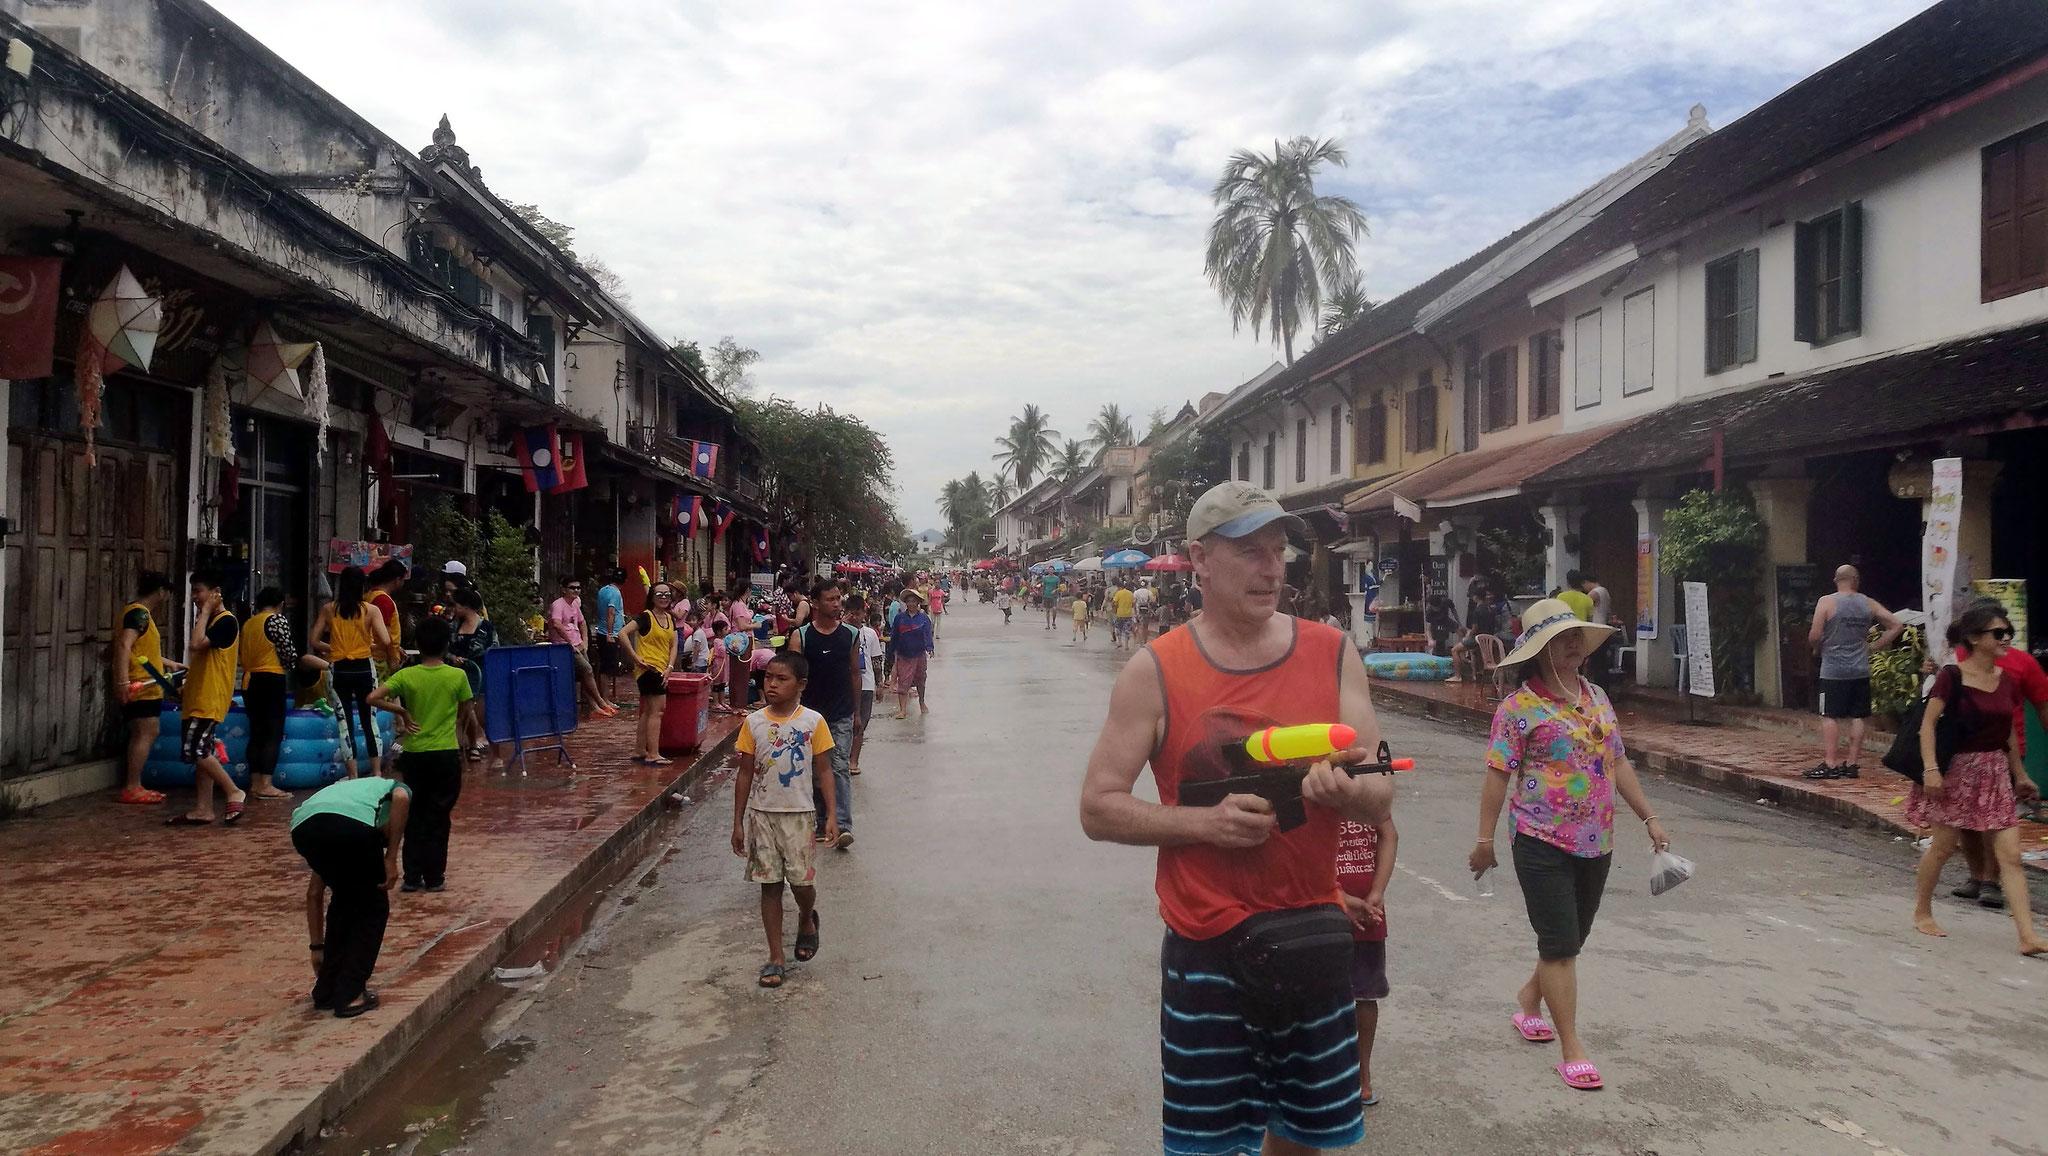 ... in der familiären Athmosphäre Luang Prabangs